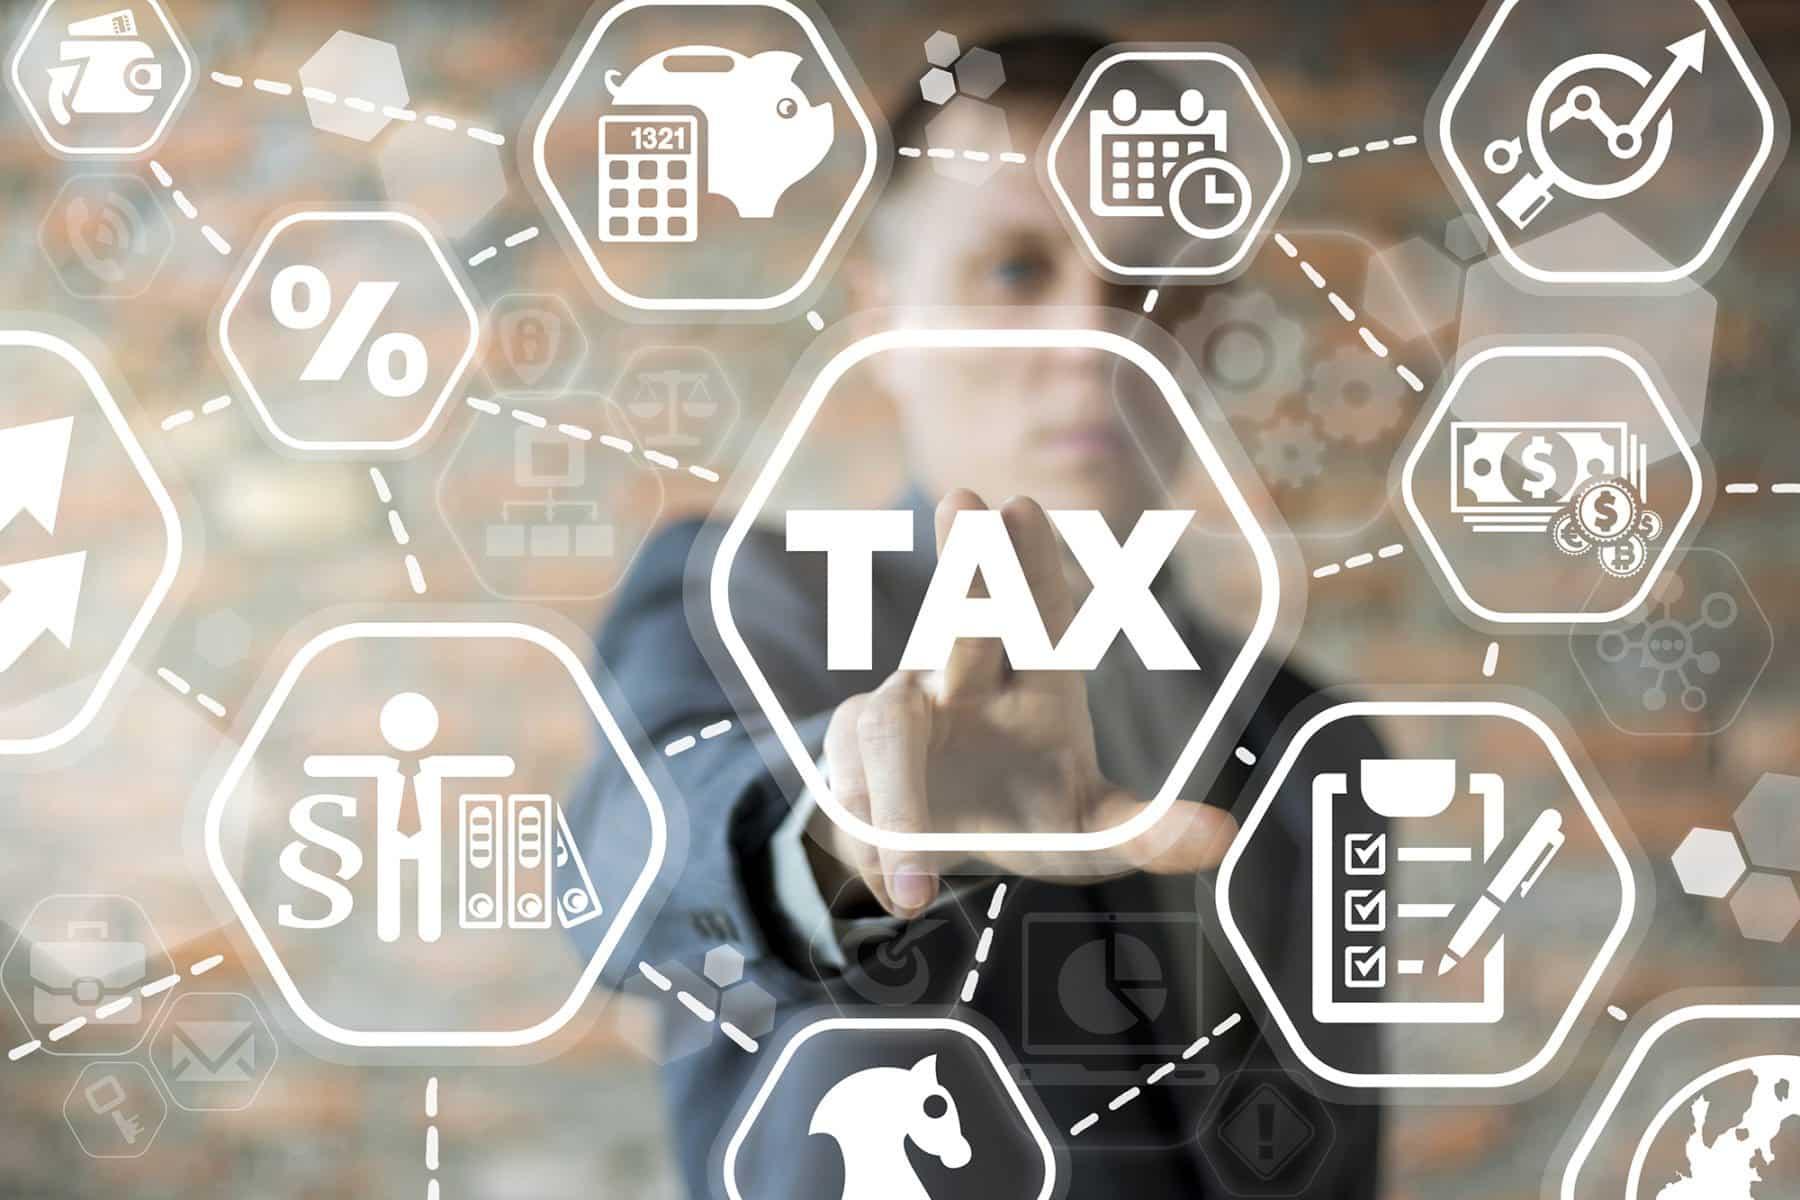 International Tax Accountants